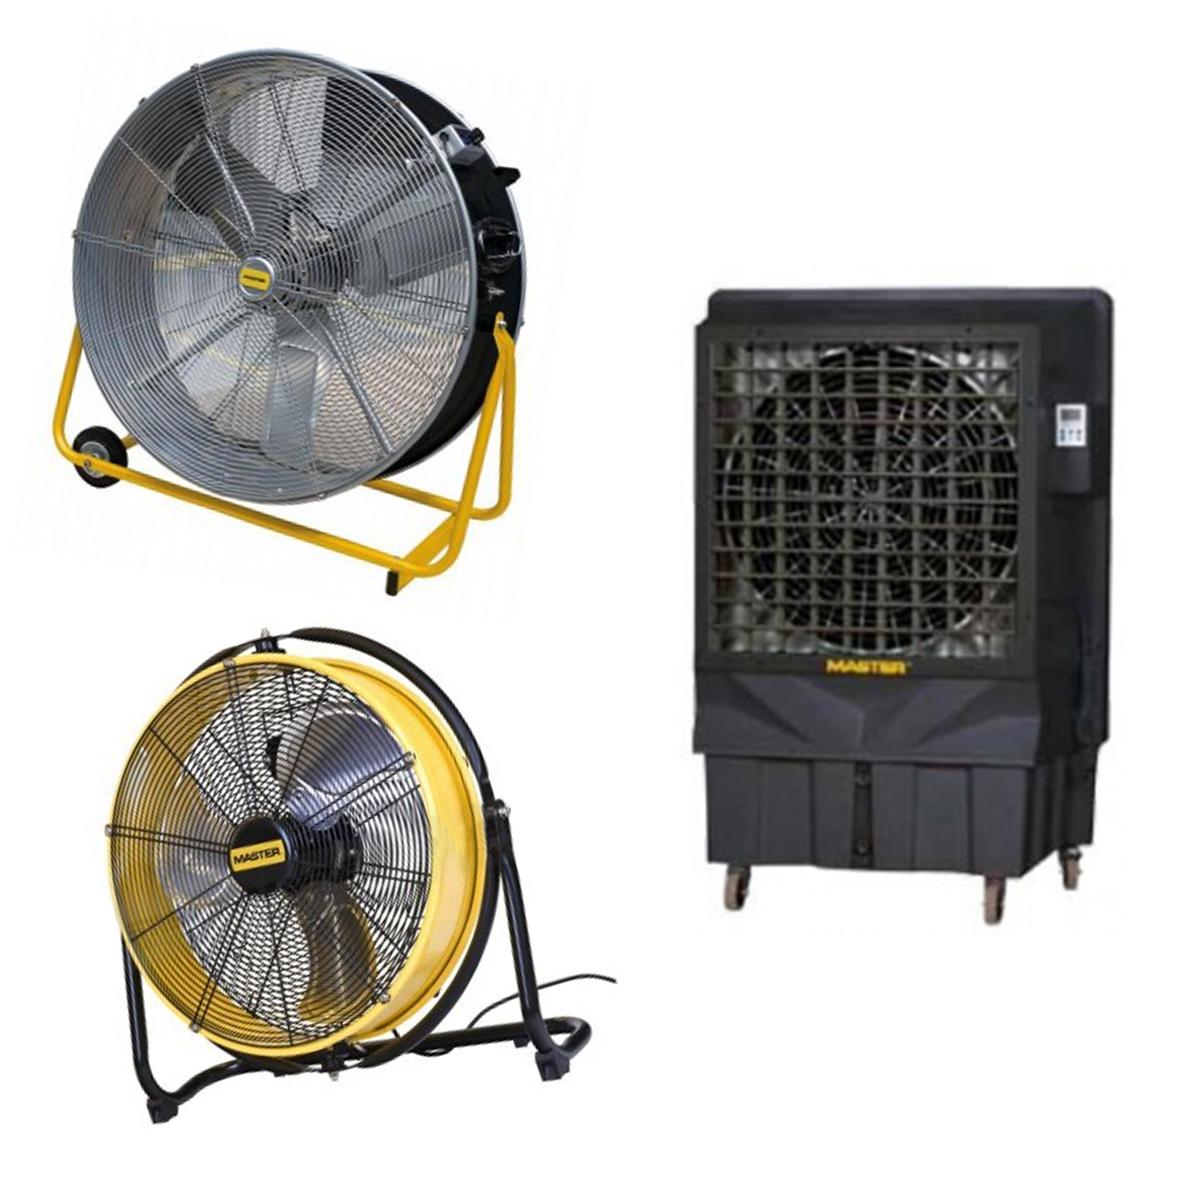 Ipari ventilátor / Léghűtő